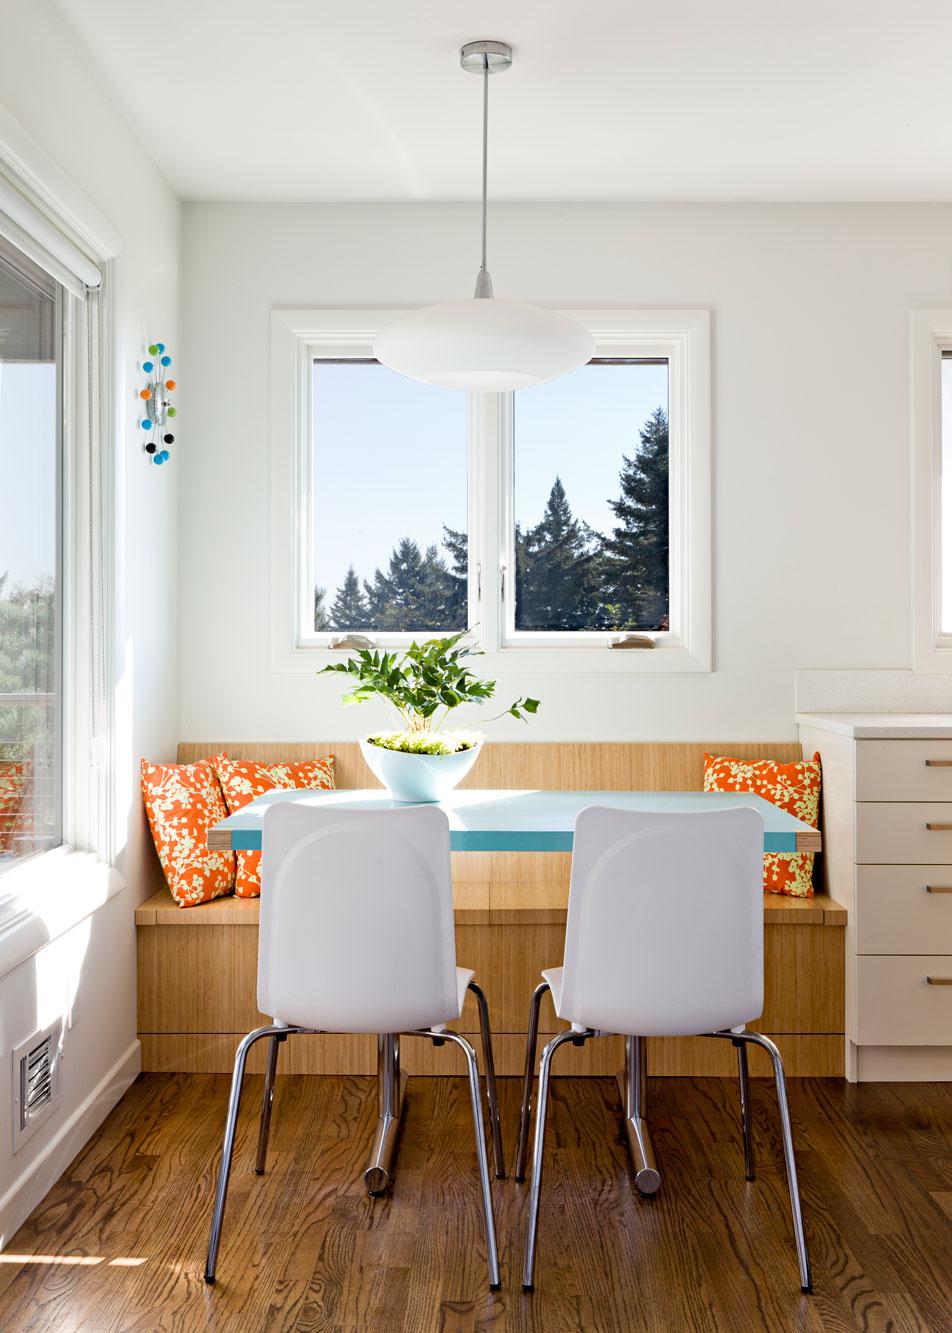 Breakfast nook featuring custom merkeled table